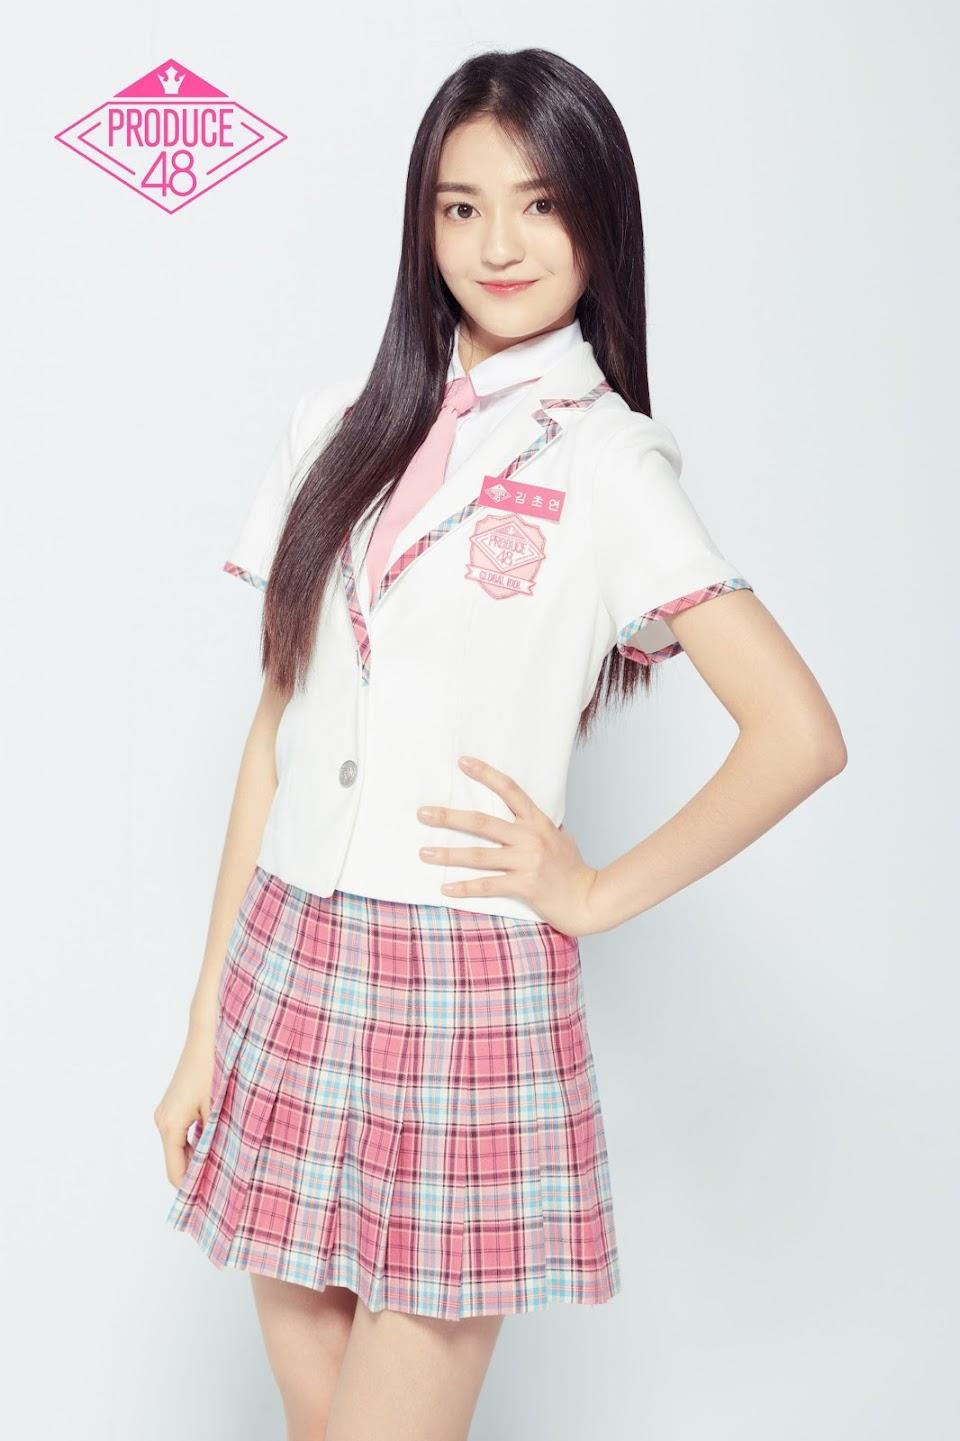 Kim_Choyeon_Produce_48